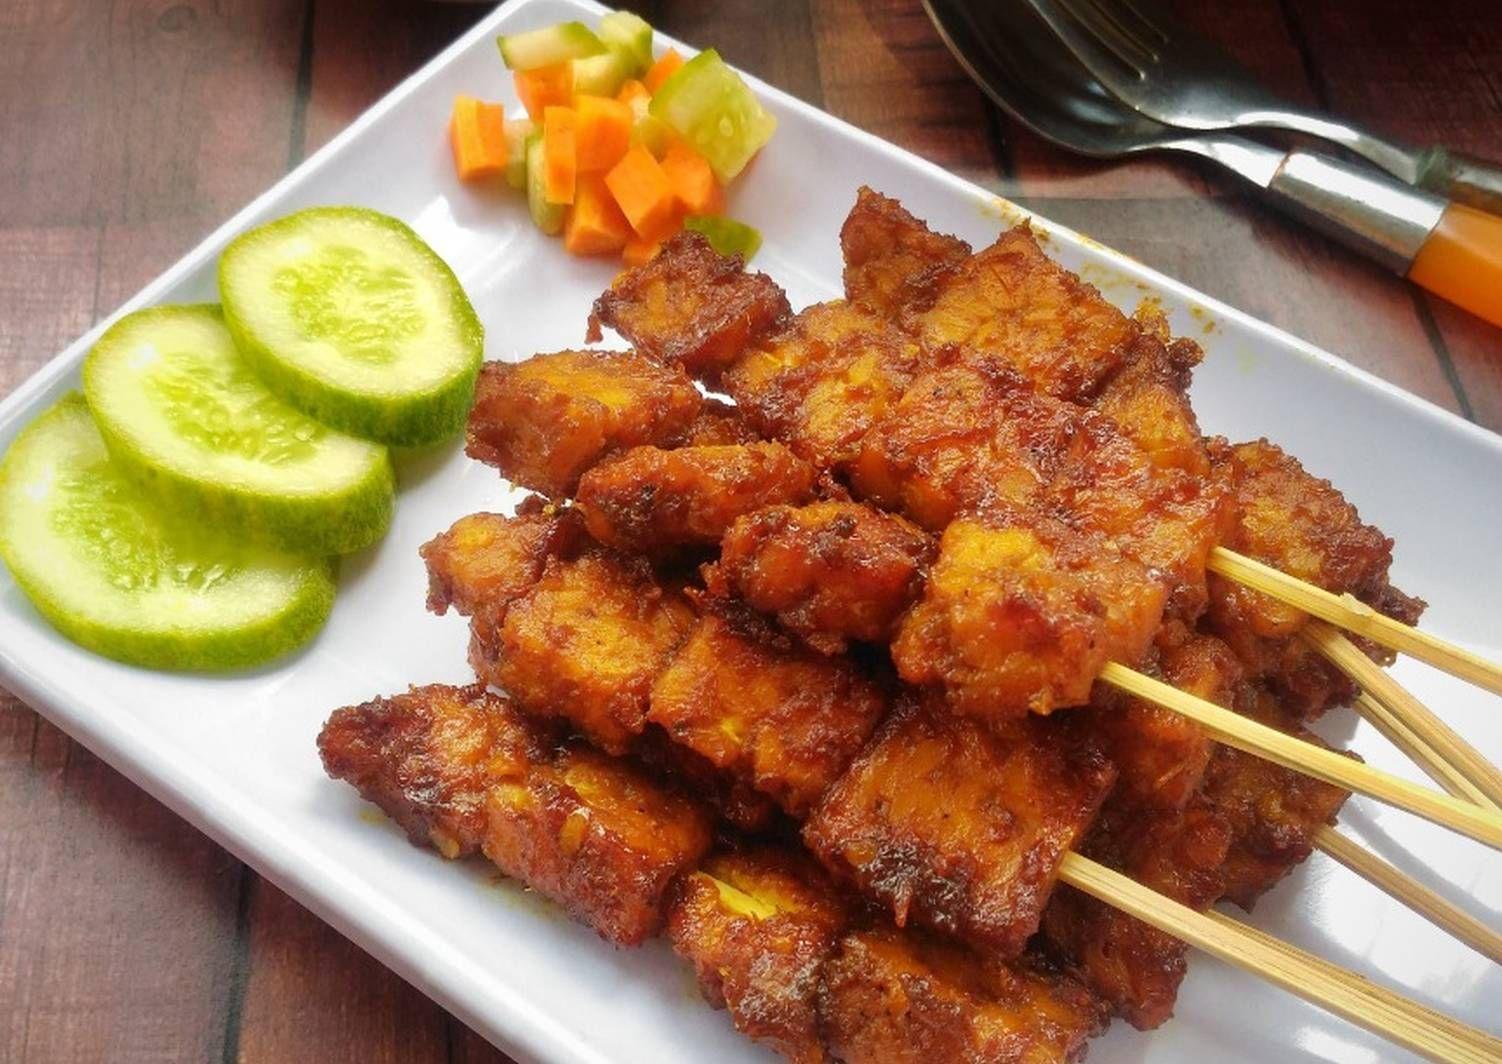 Resep Sate Tempe Oleh Mamaquink Resep Resep Masakan Asia Resep Resep Tempe